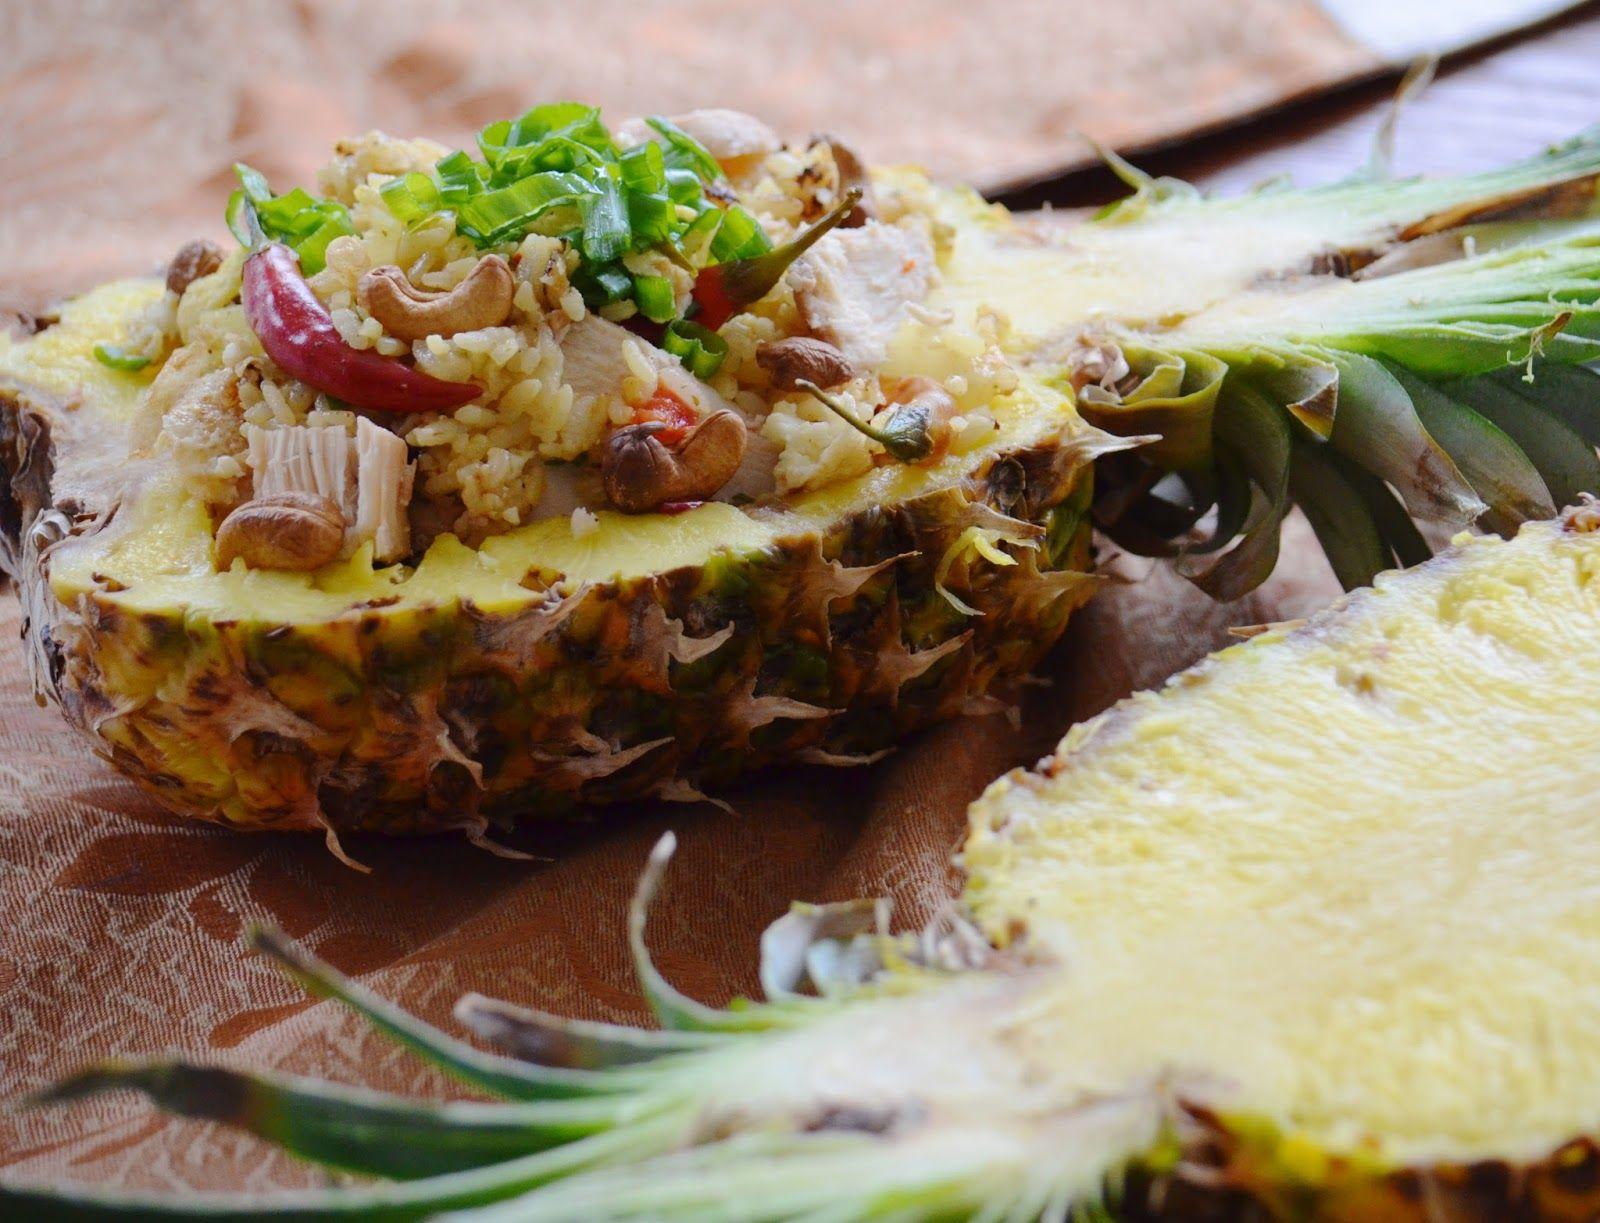 Obsessive Cooking Disorder: Thai Pineapple Fried Rice (Khao Pad Sapparot)